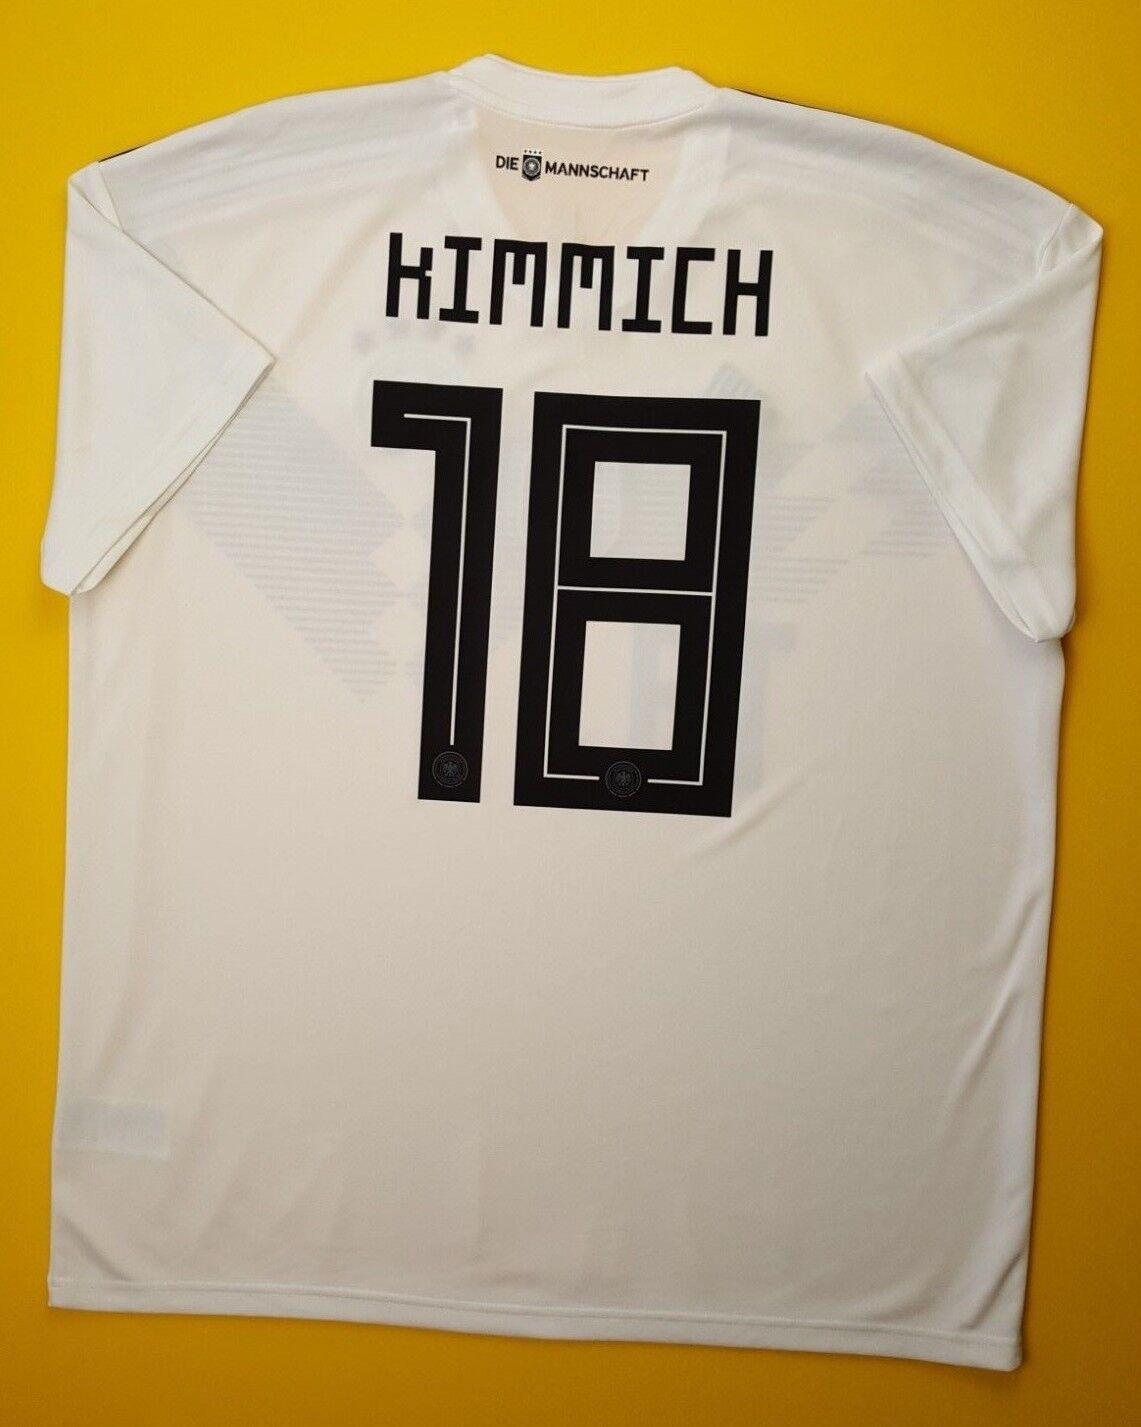 5+ 5 Kimmich Germany jersey XL 2018 DFB home shirt BR7843 soccer fotball Adidas